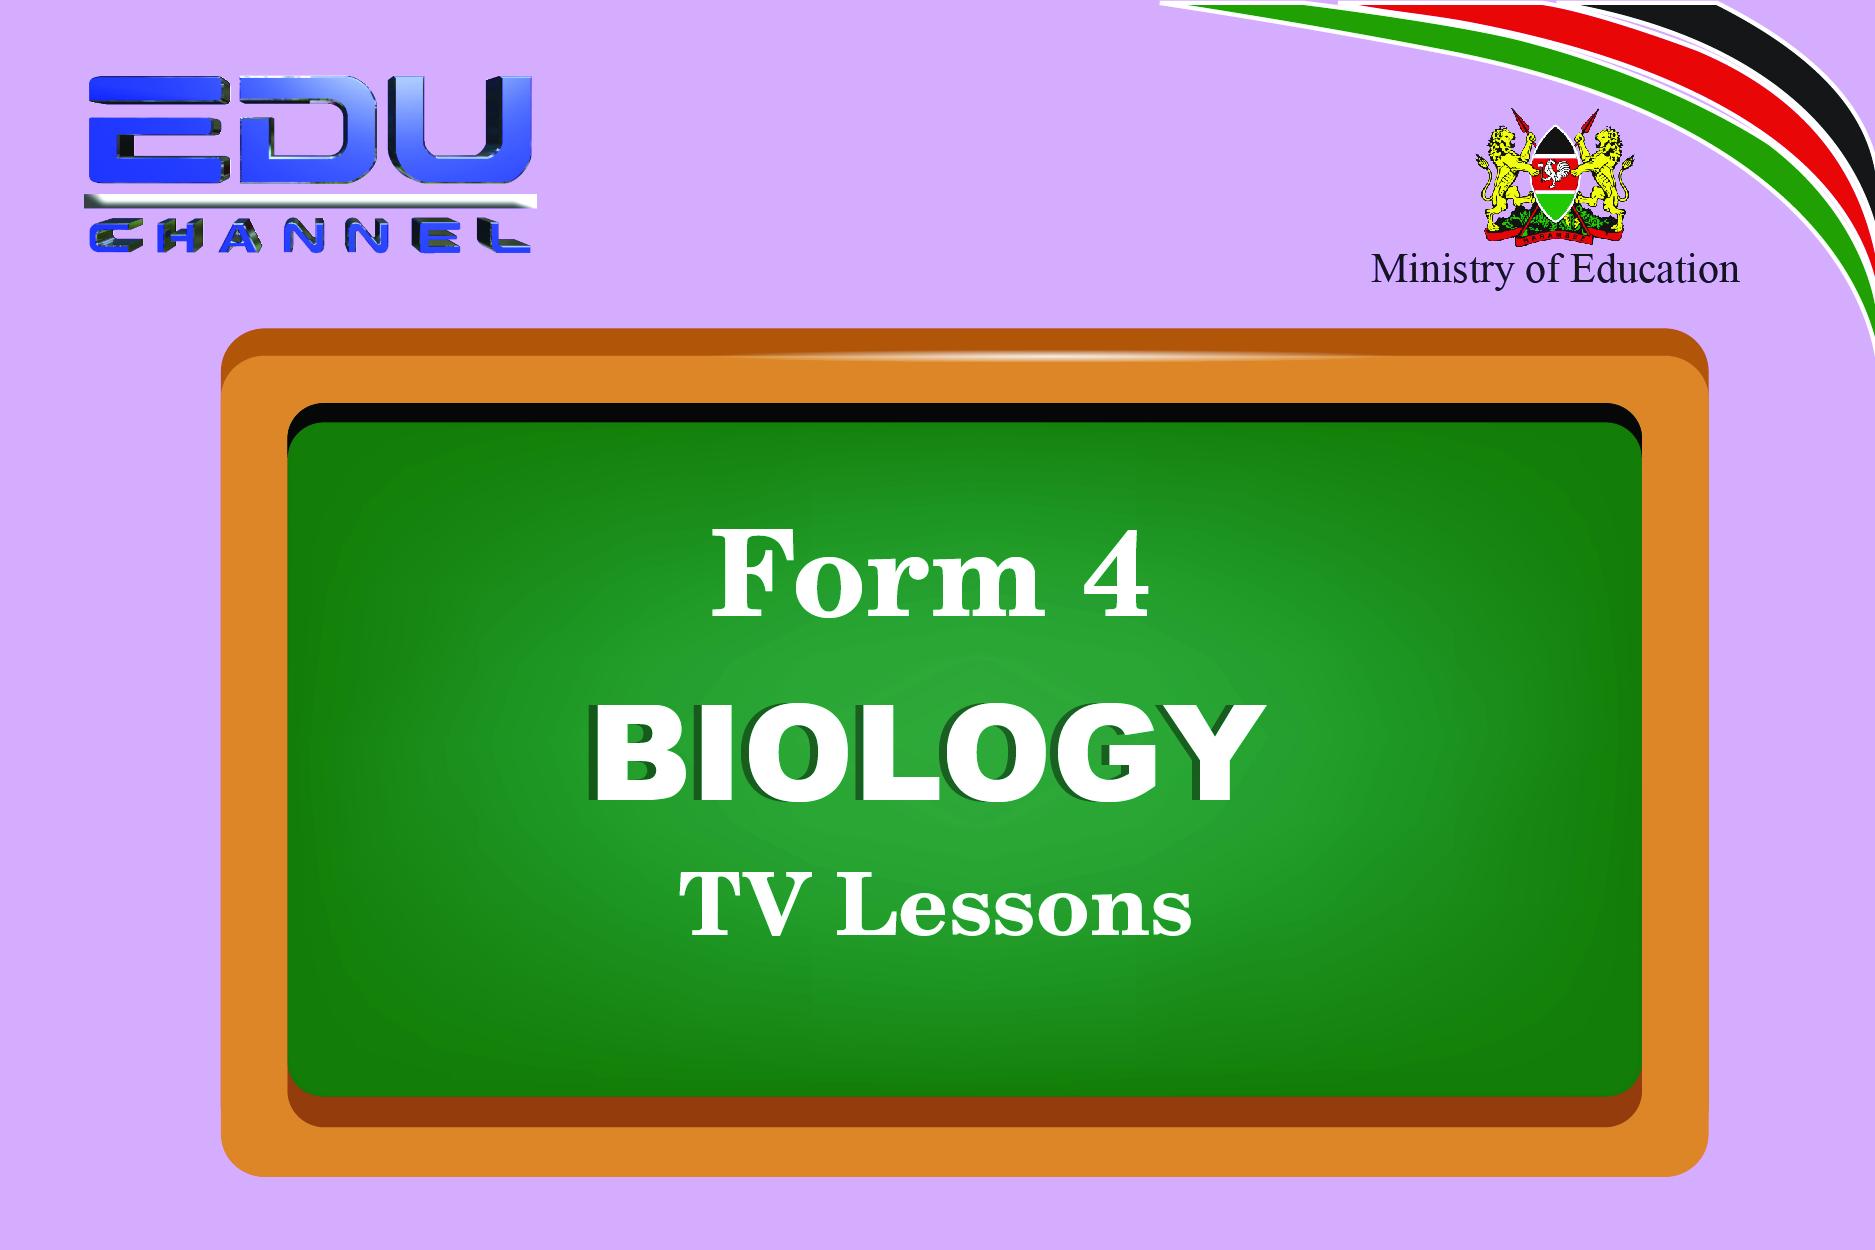 Form 4 Biology Lesson 6:Sense Organ -The Eye